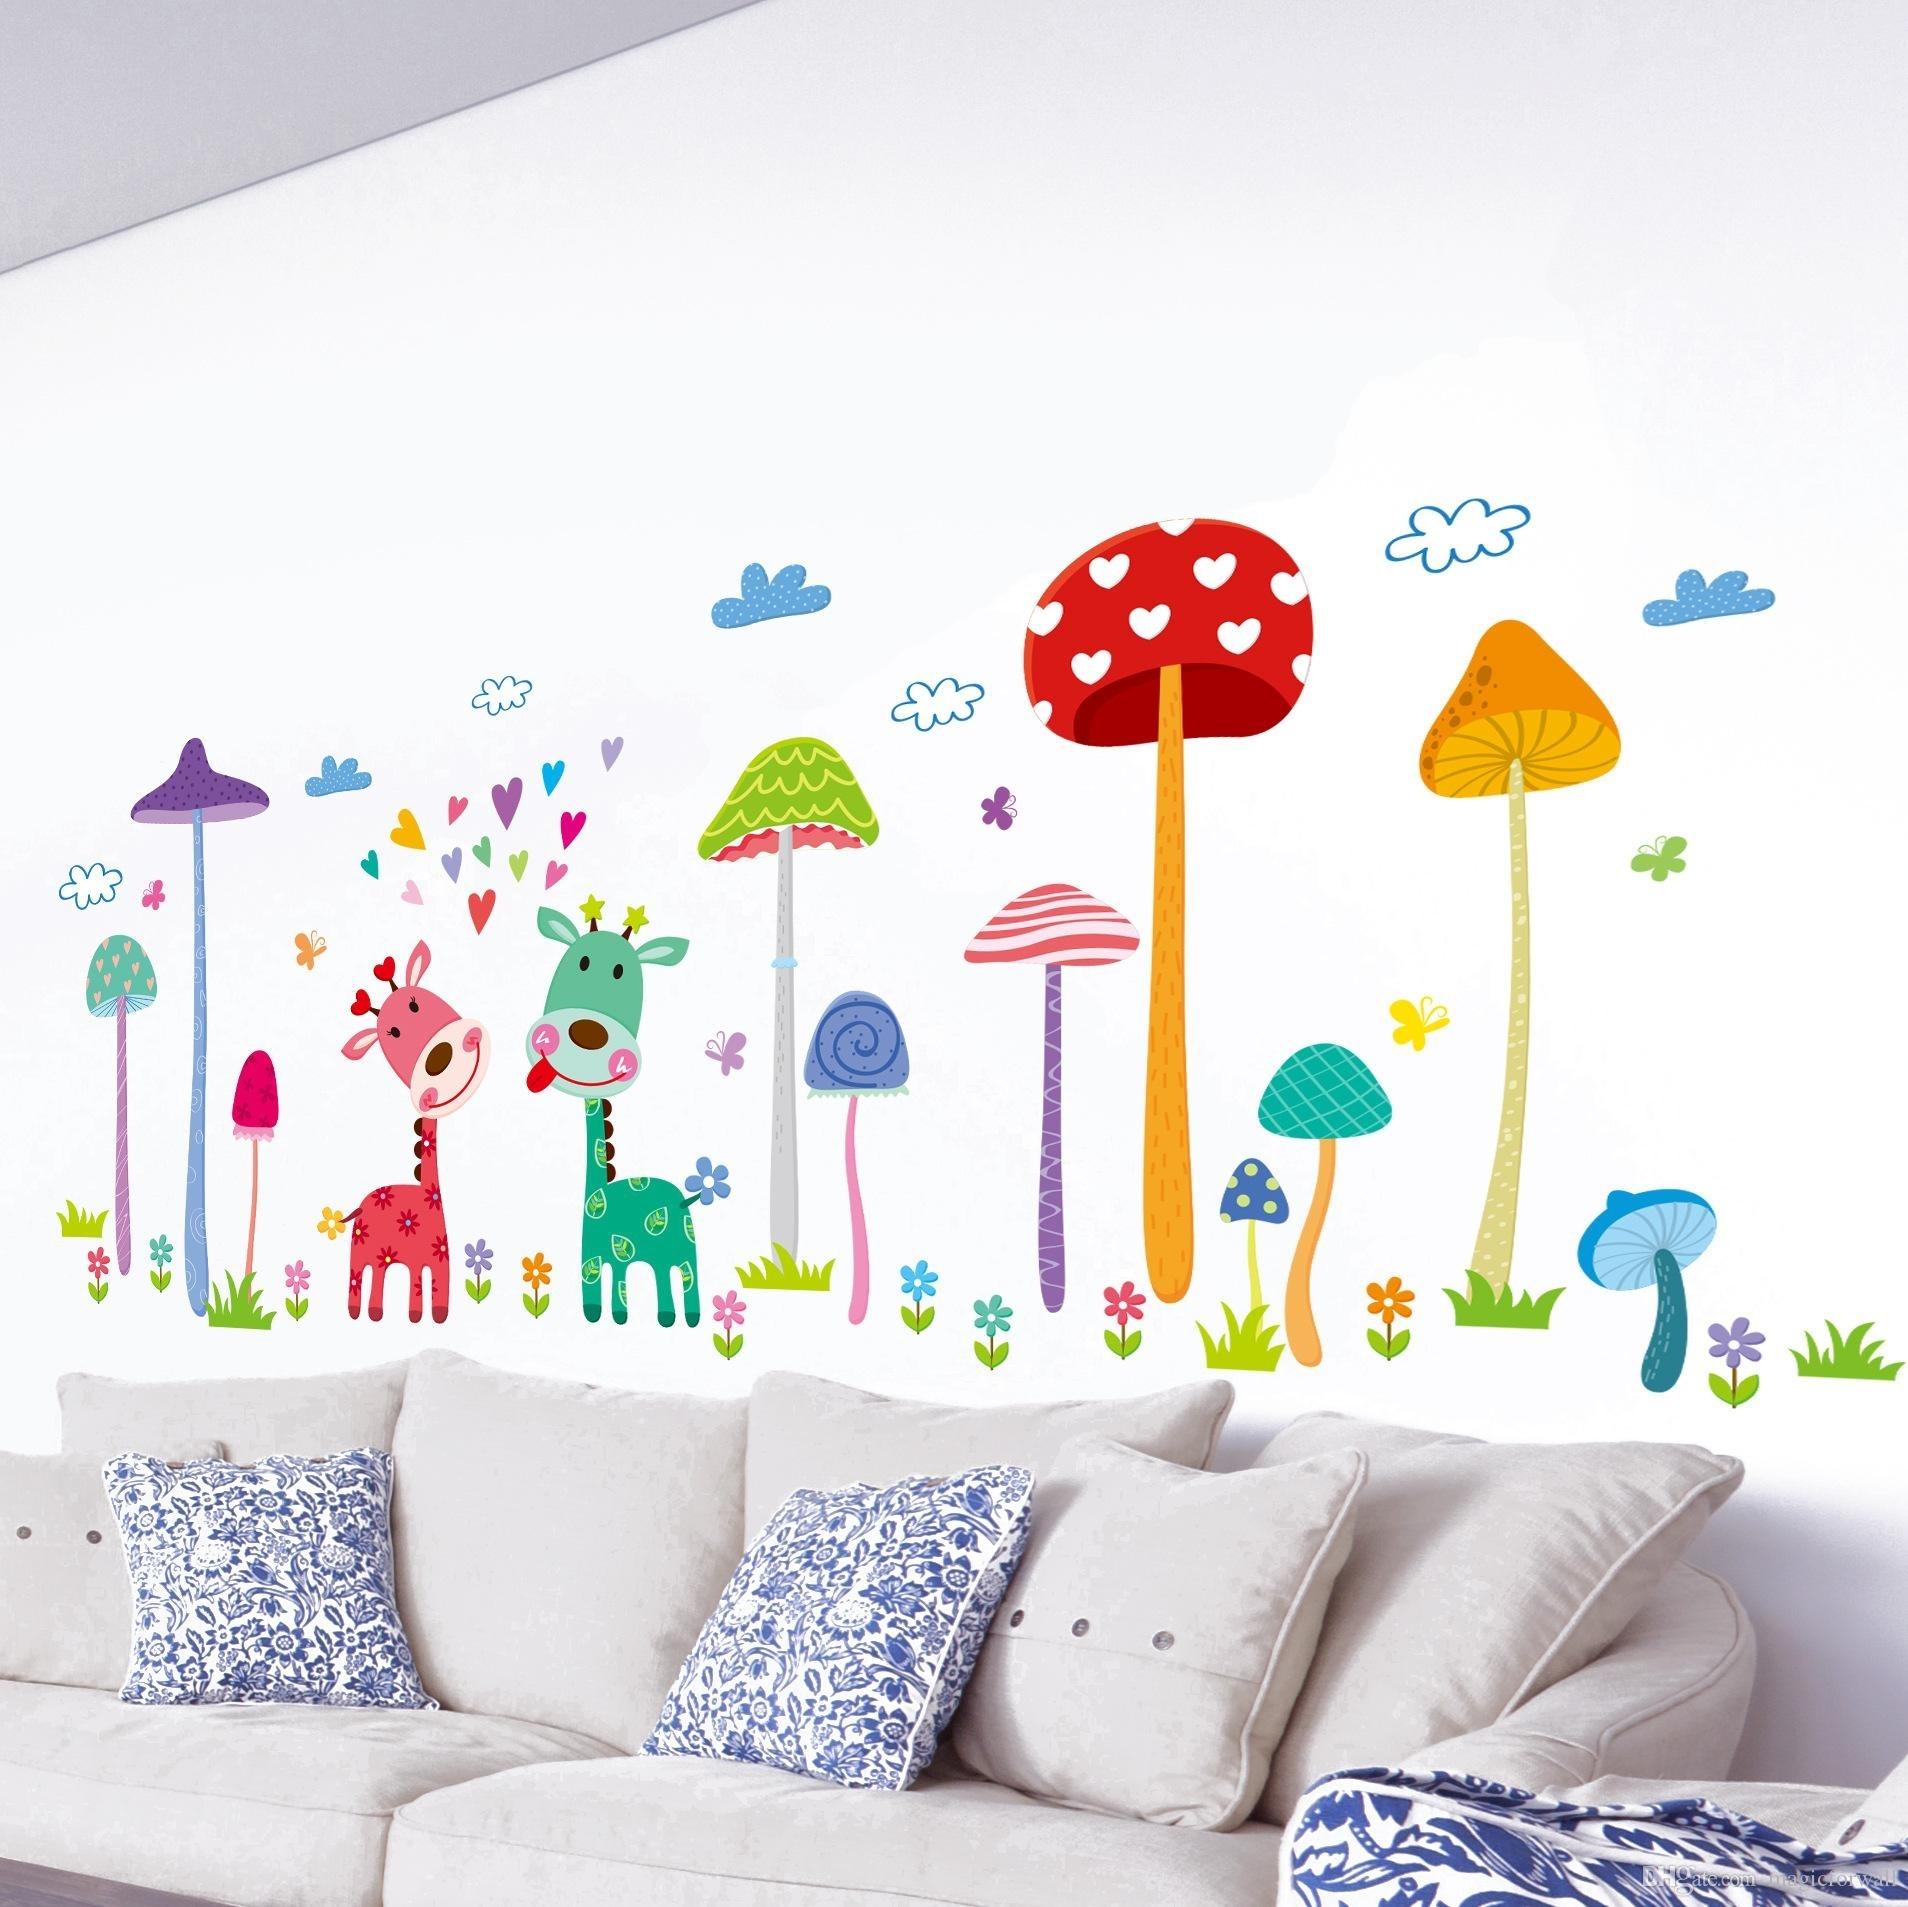 Forest Mushroom Deer Animals Home Wall Art Mural Decor Kids Babies Throughout 2018 Baby Nursery Fabric Wall Art (View 8 of 15)